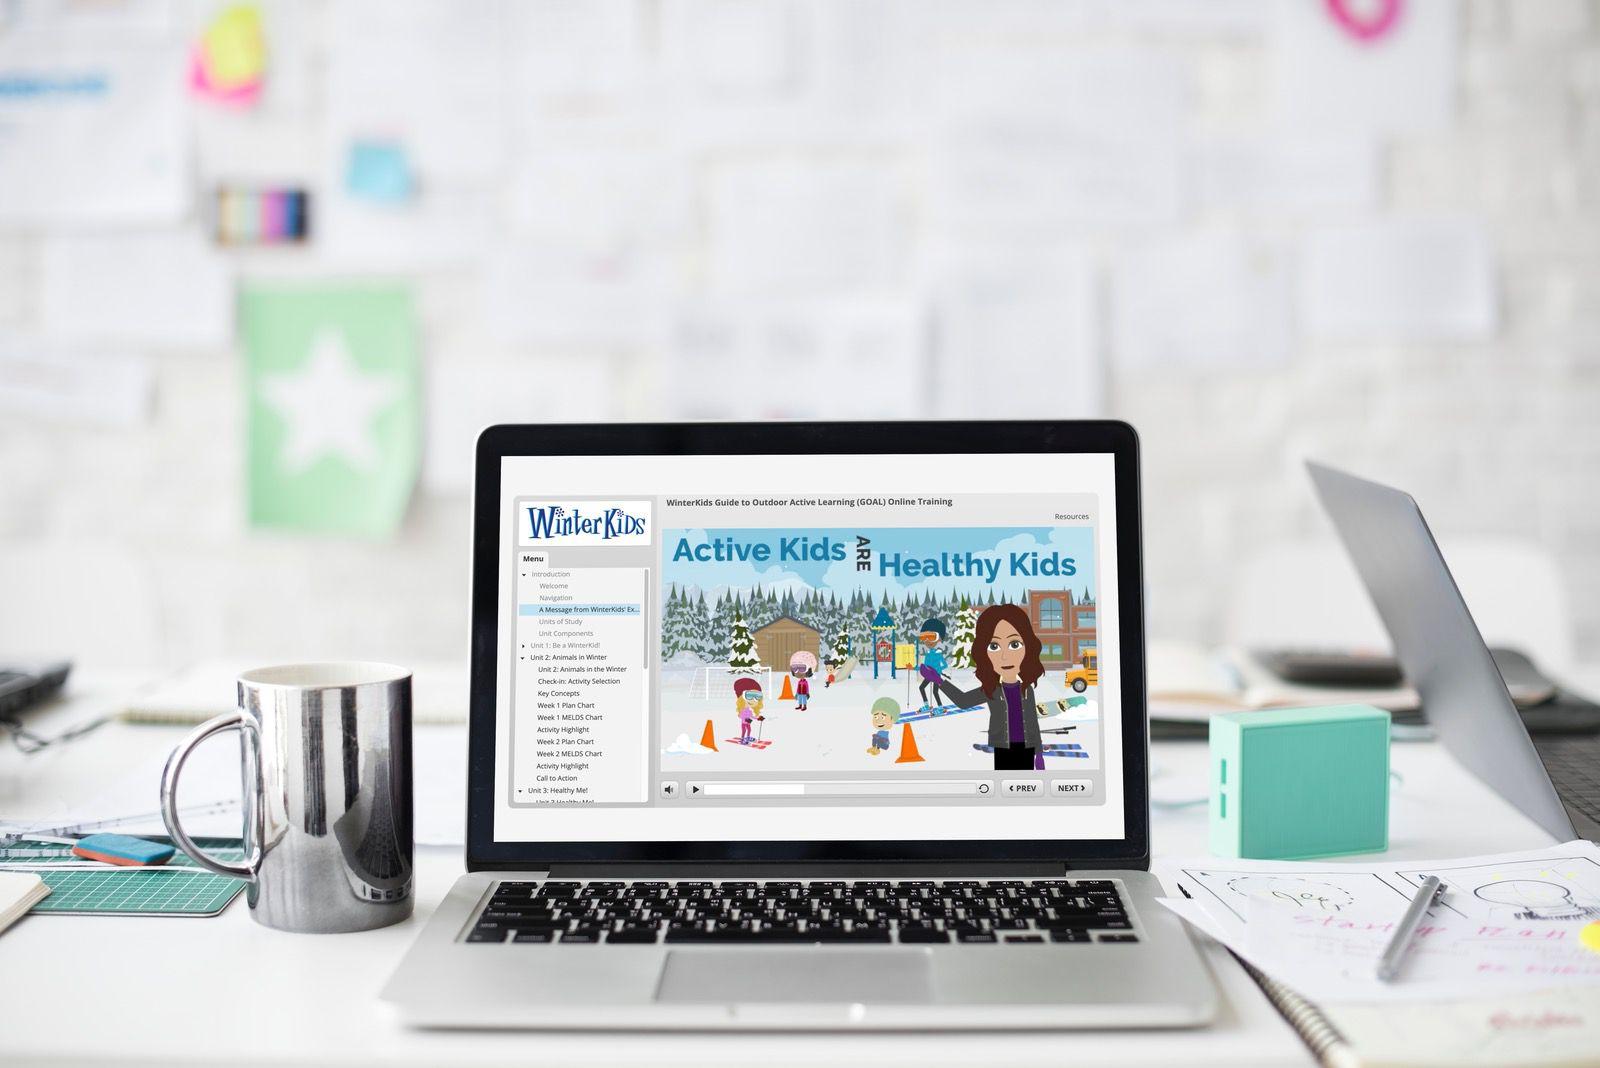 WinterKids Offering a FREE Spring Virtual Training for Preschool Teachers